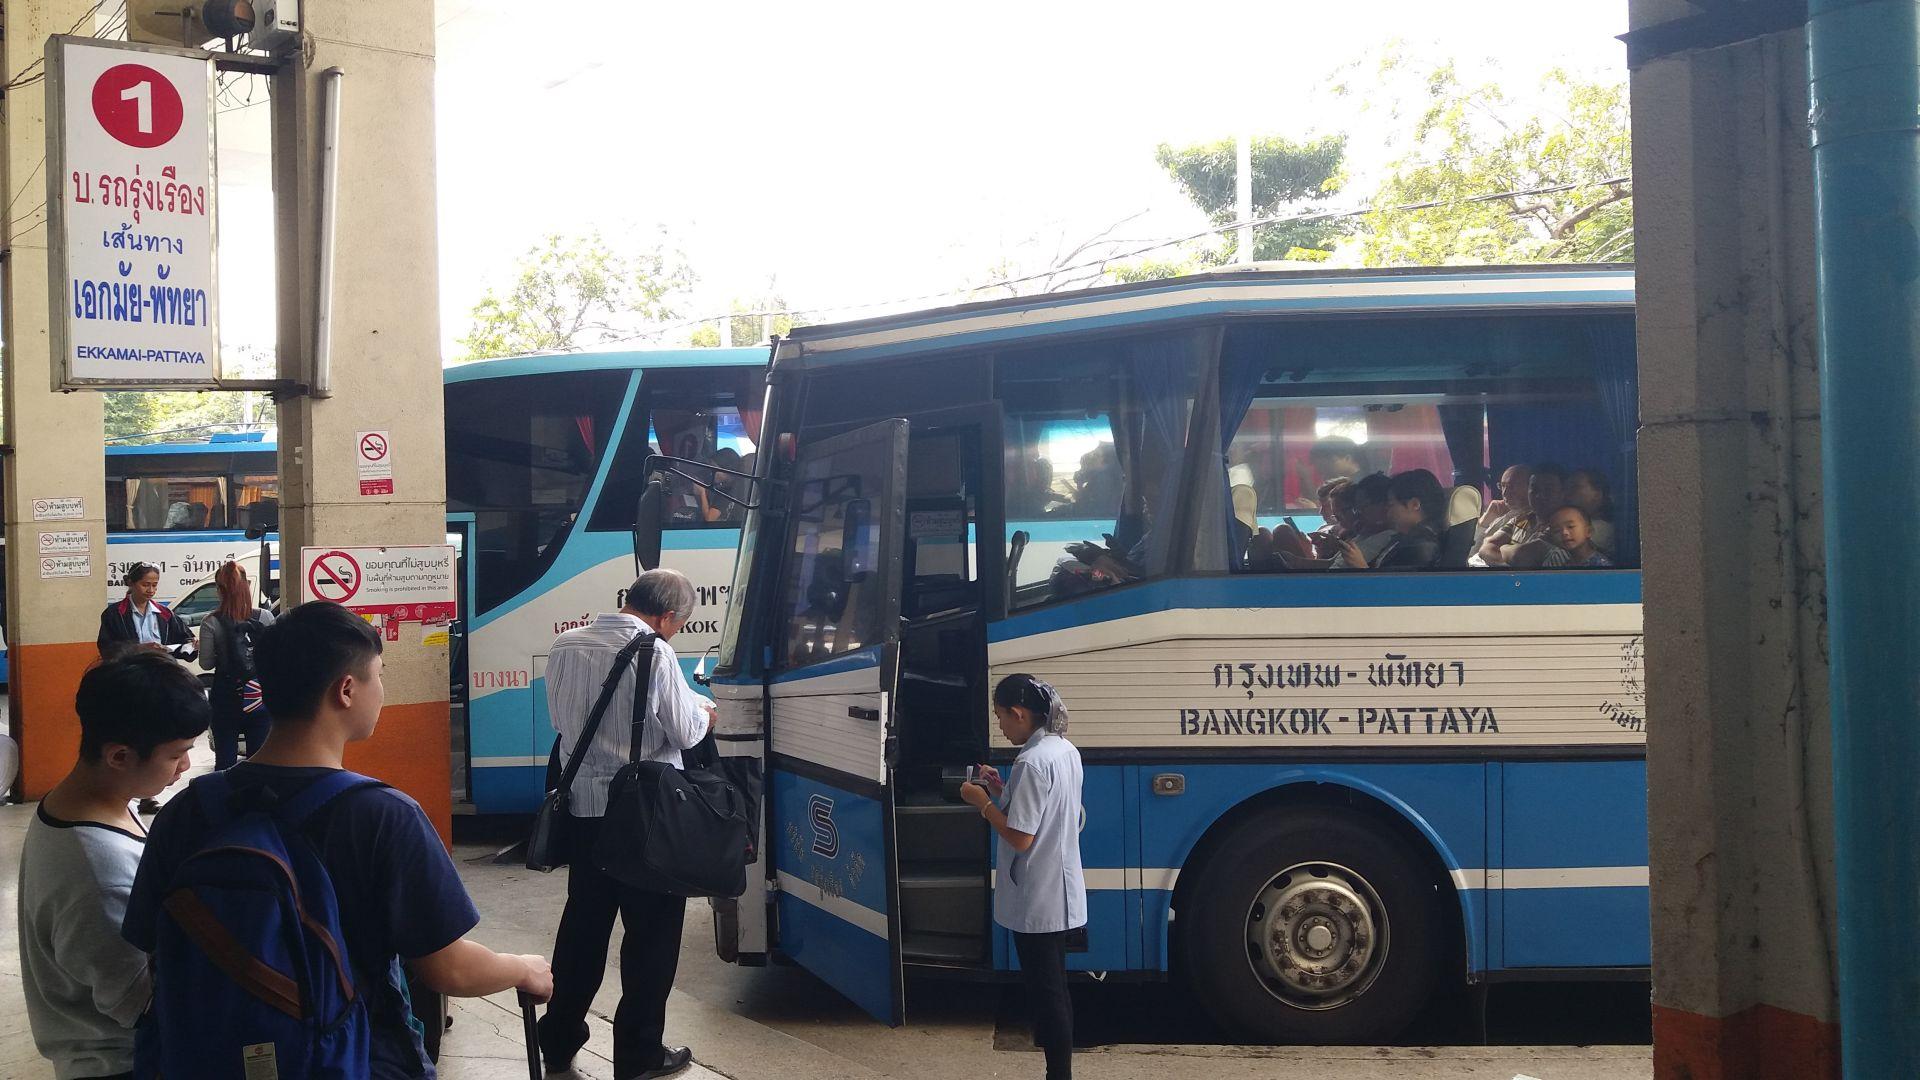 Autobus Bangkok - Pattaya.